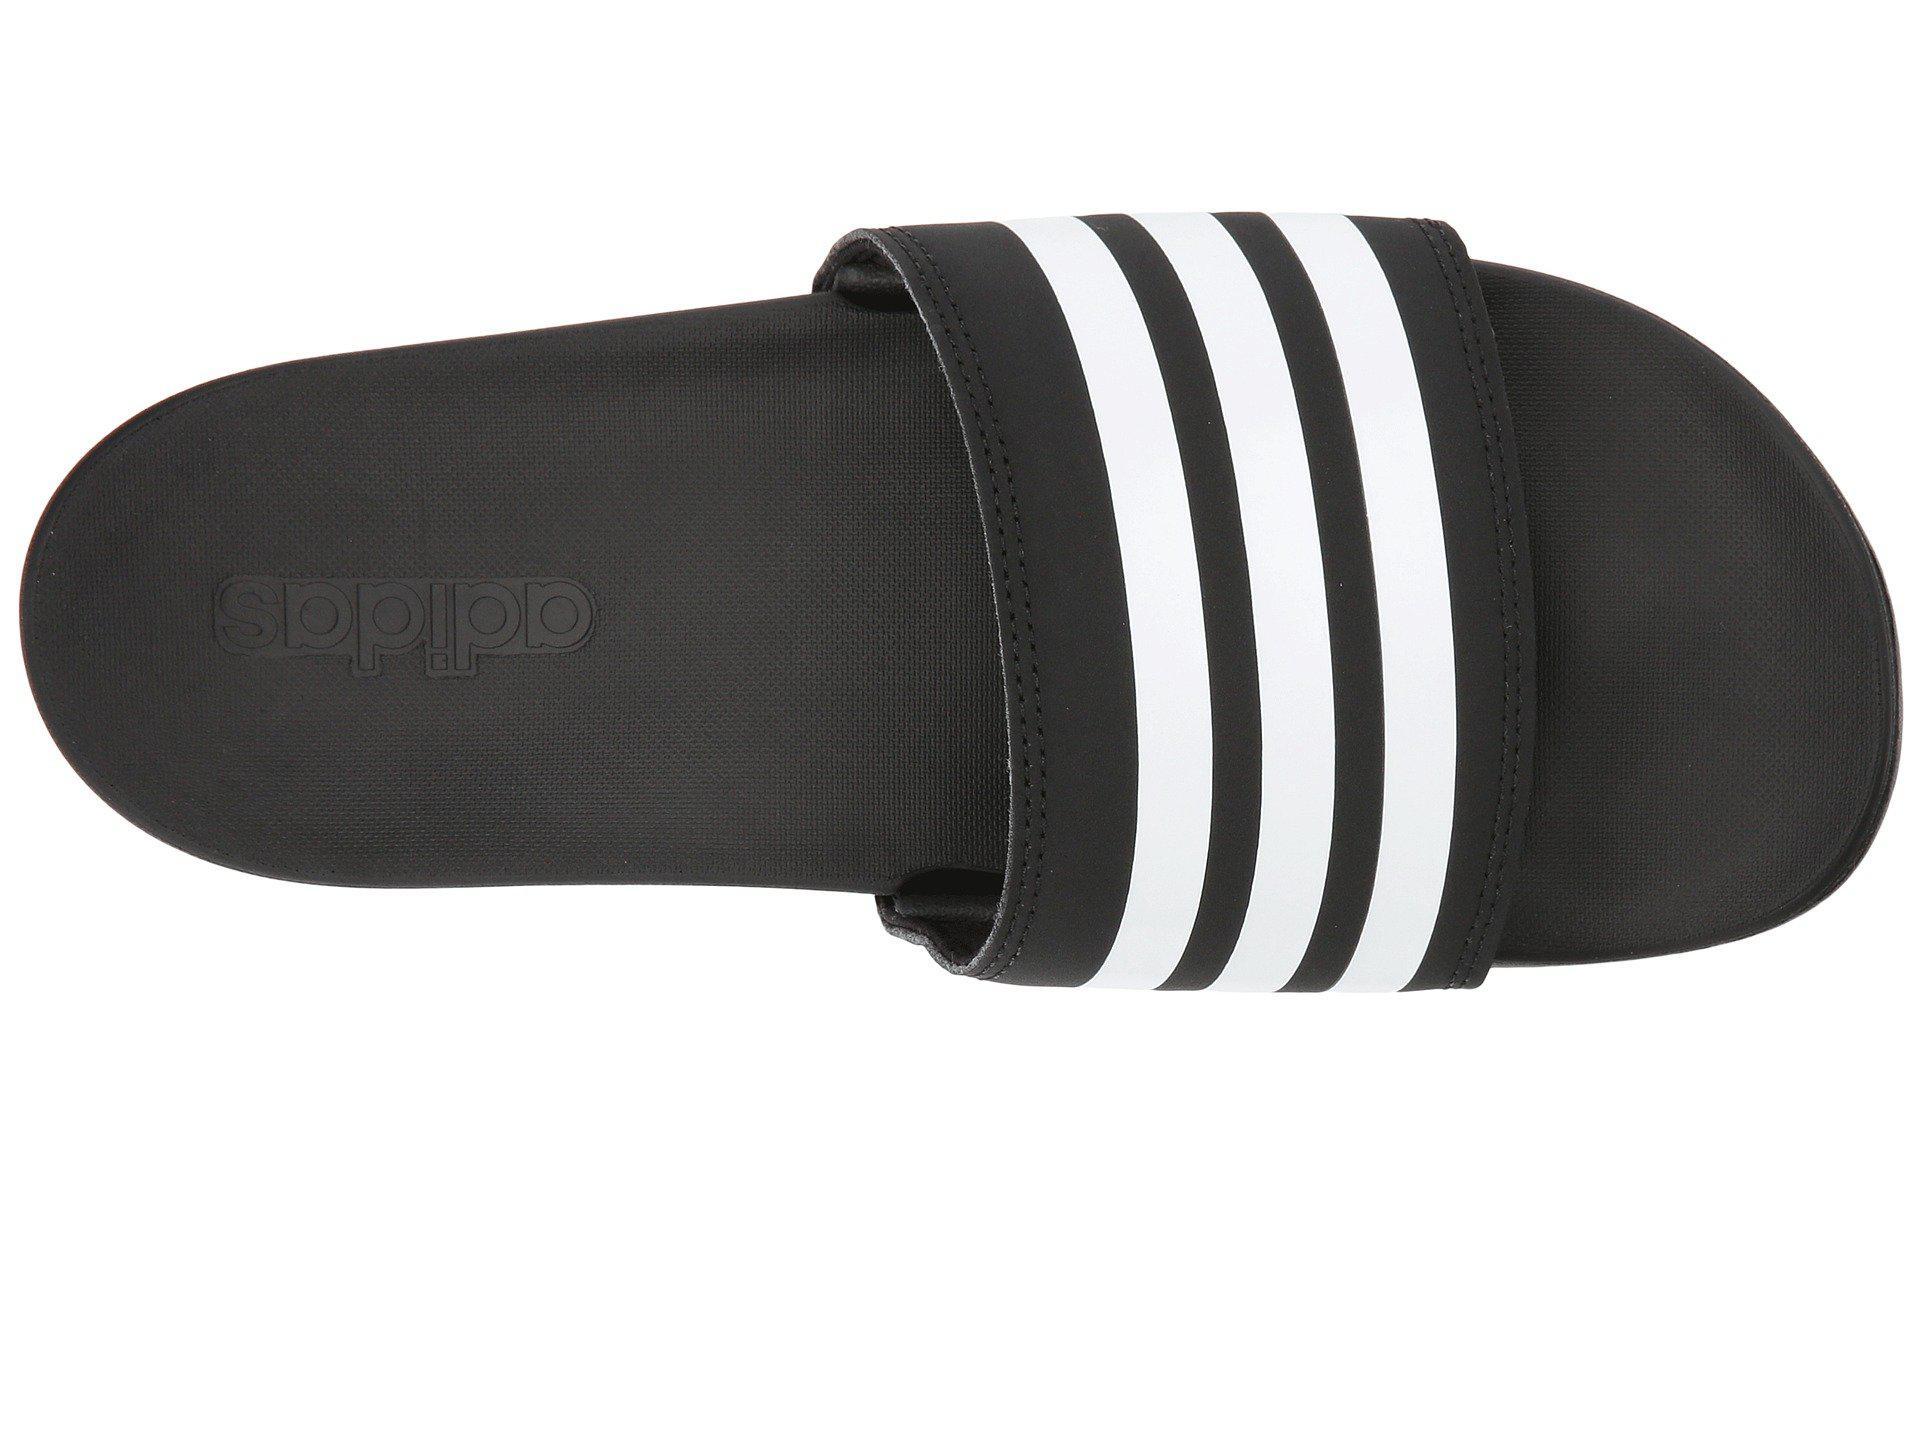 huge discount 47834 67b3a Adidas - Black Adilette Cloudfoam Plus Stripes Slides - Lyst. View  fullscreen